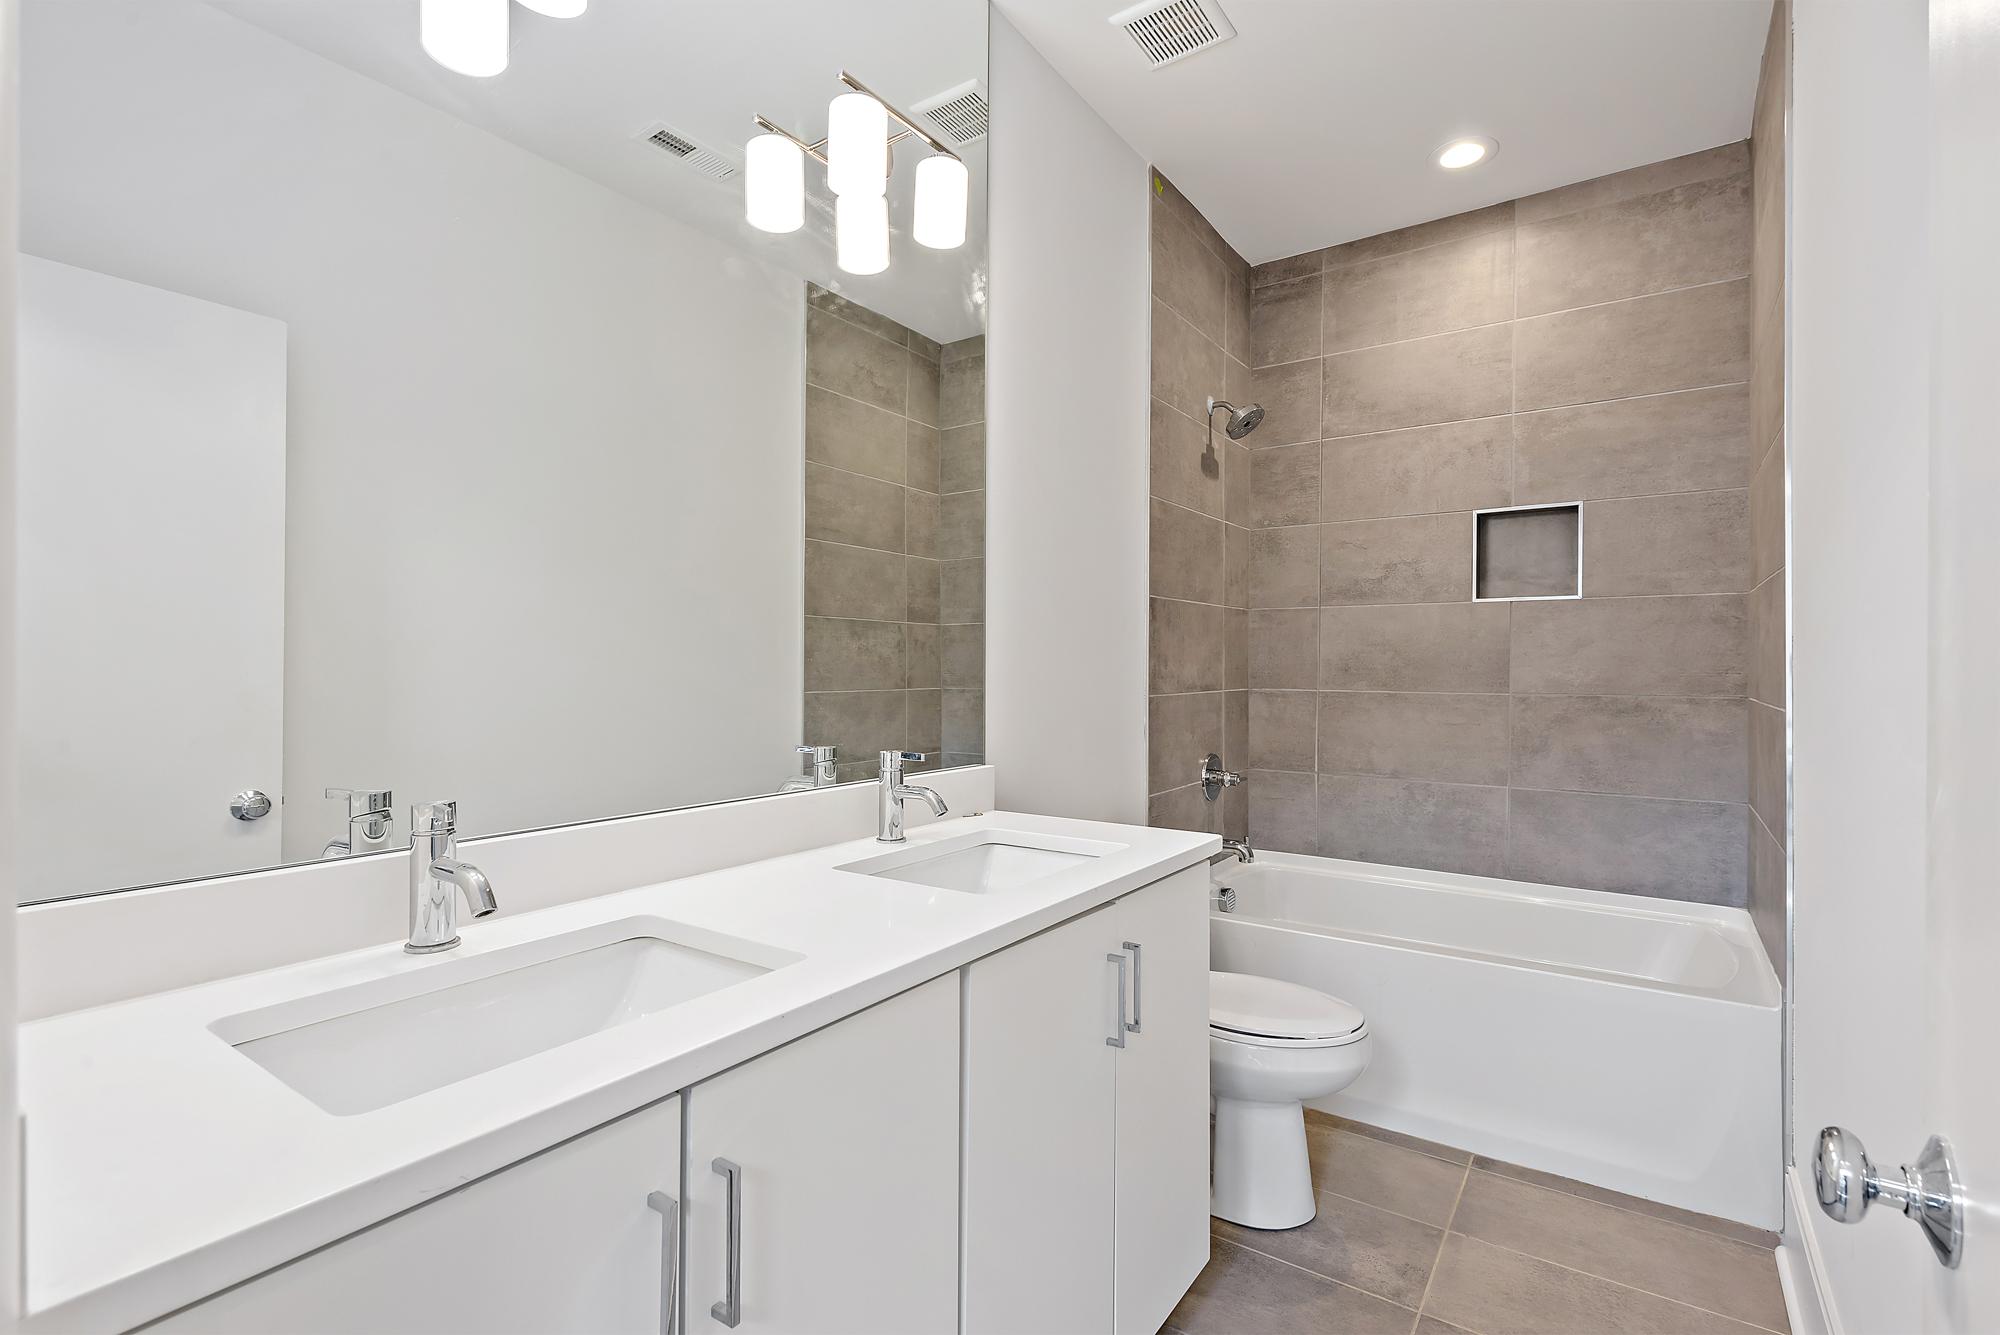 Shared upstairs bath